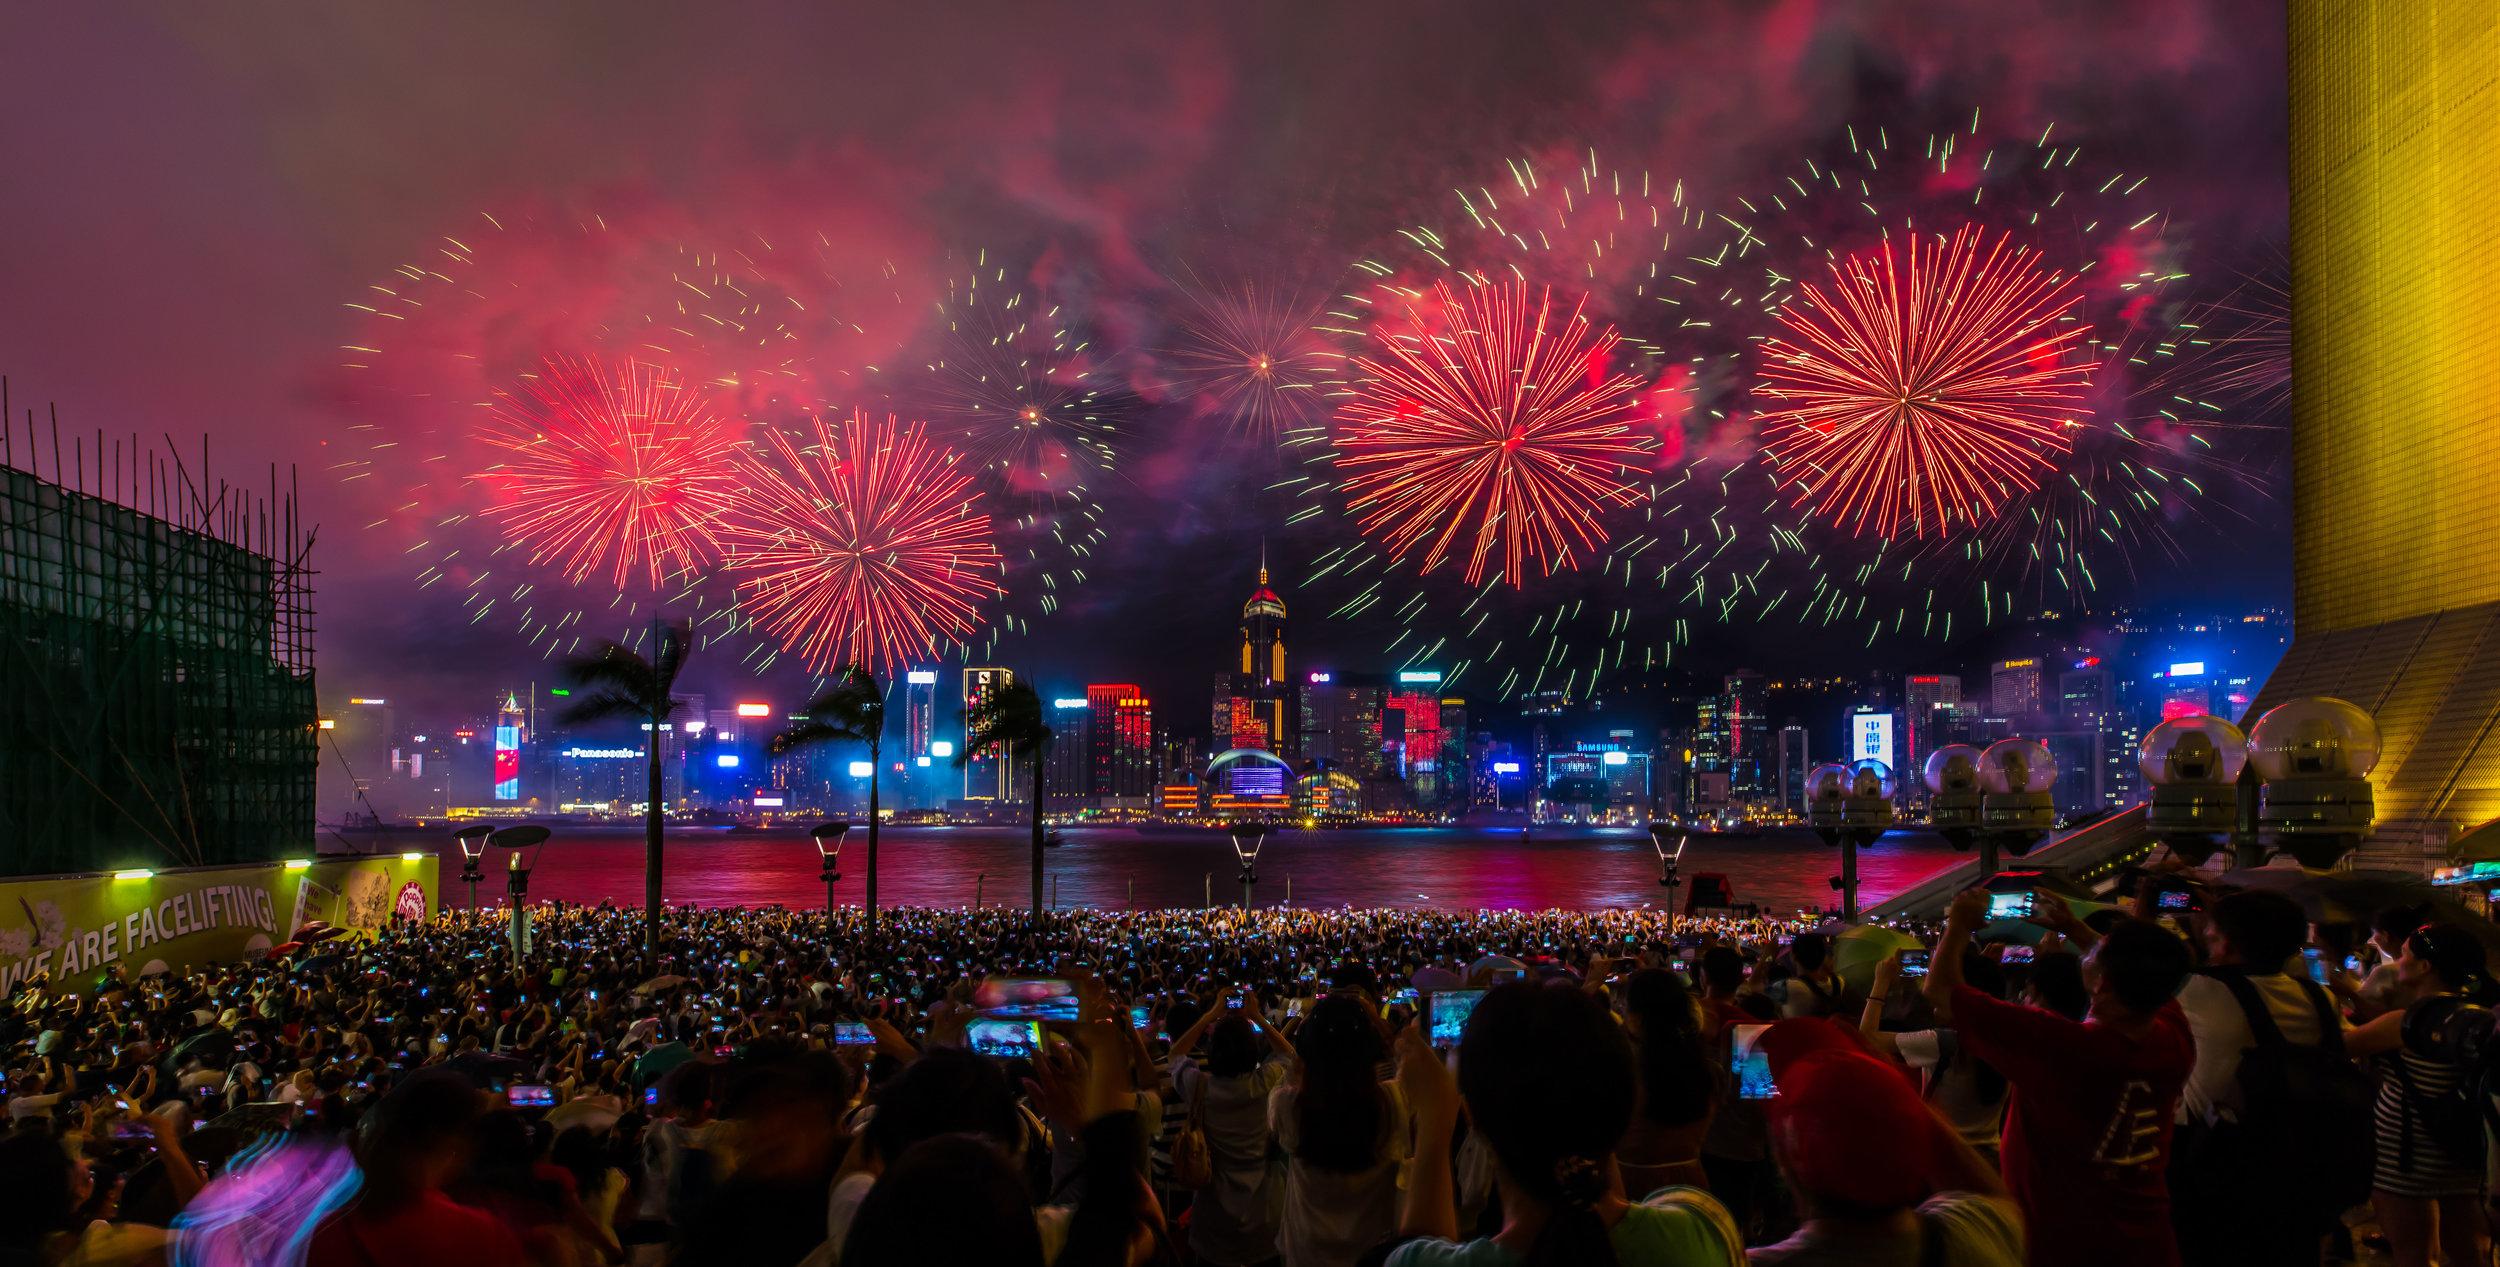 Fireworks Display 2017 #8